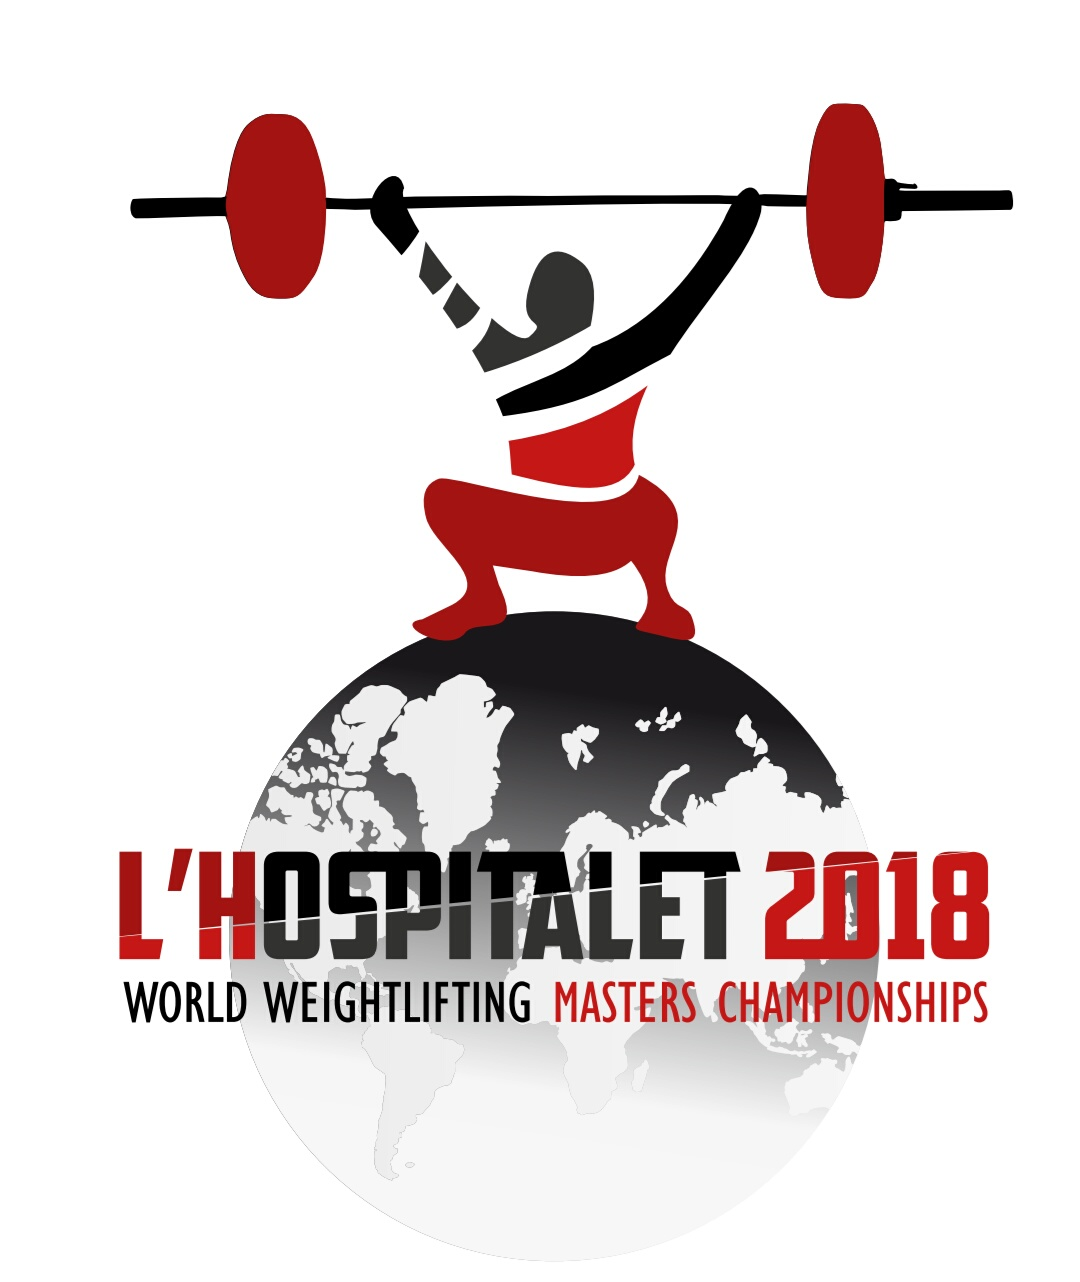 L'HOSPITALET 2018